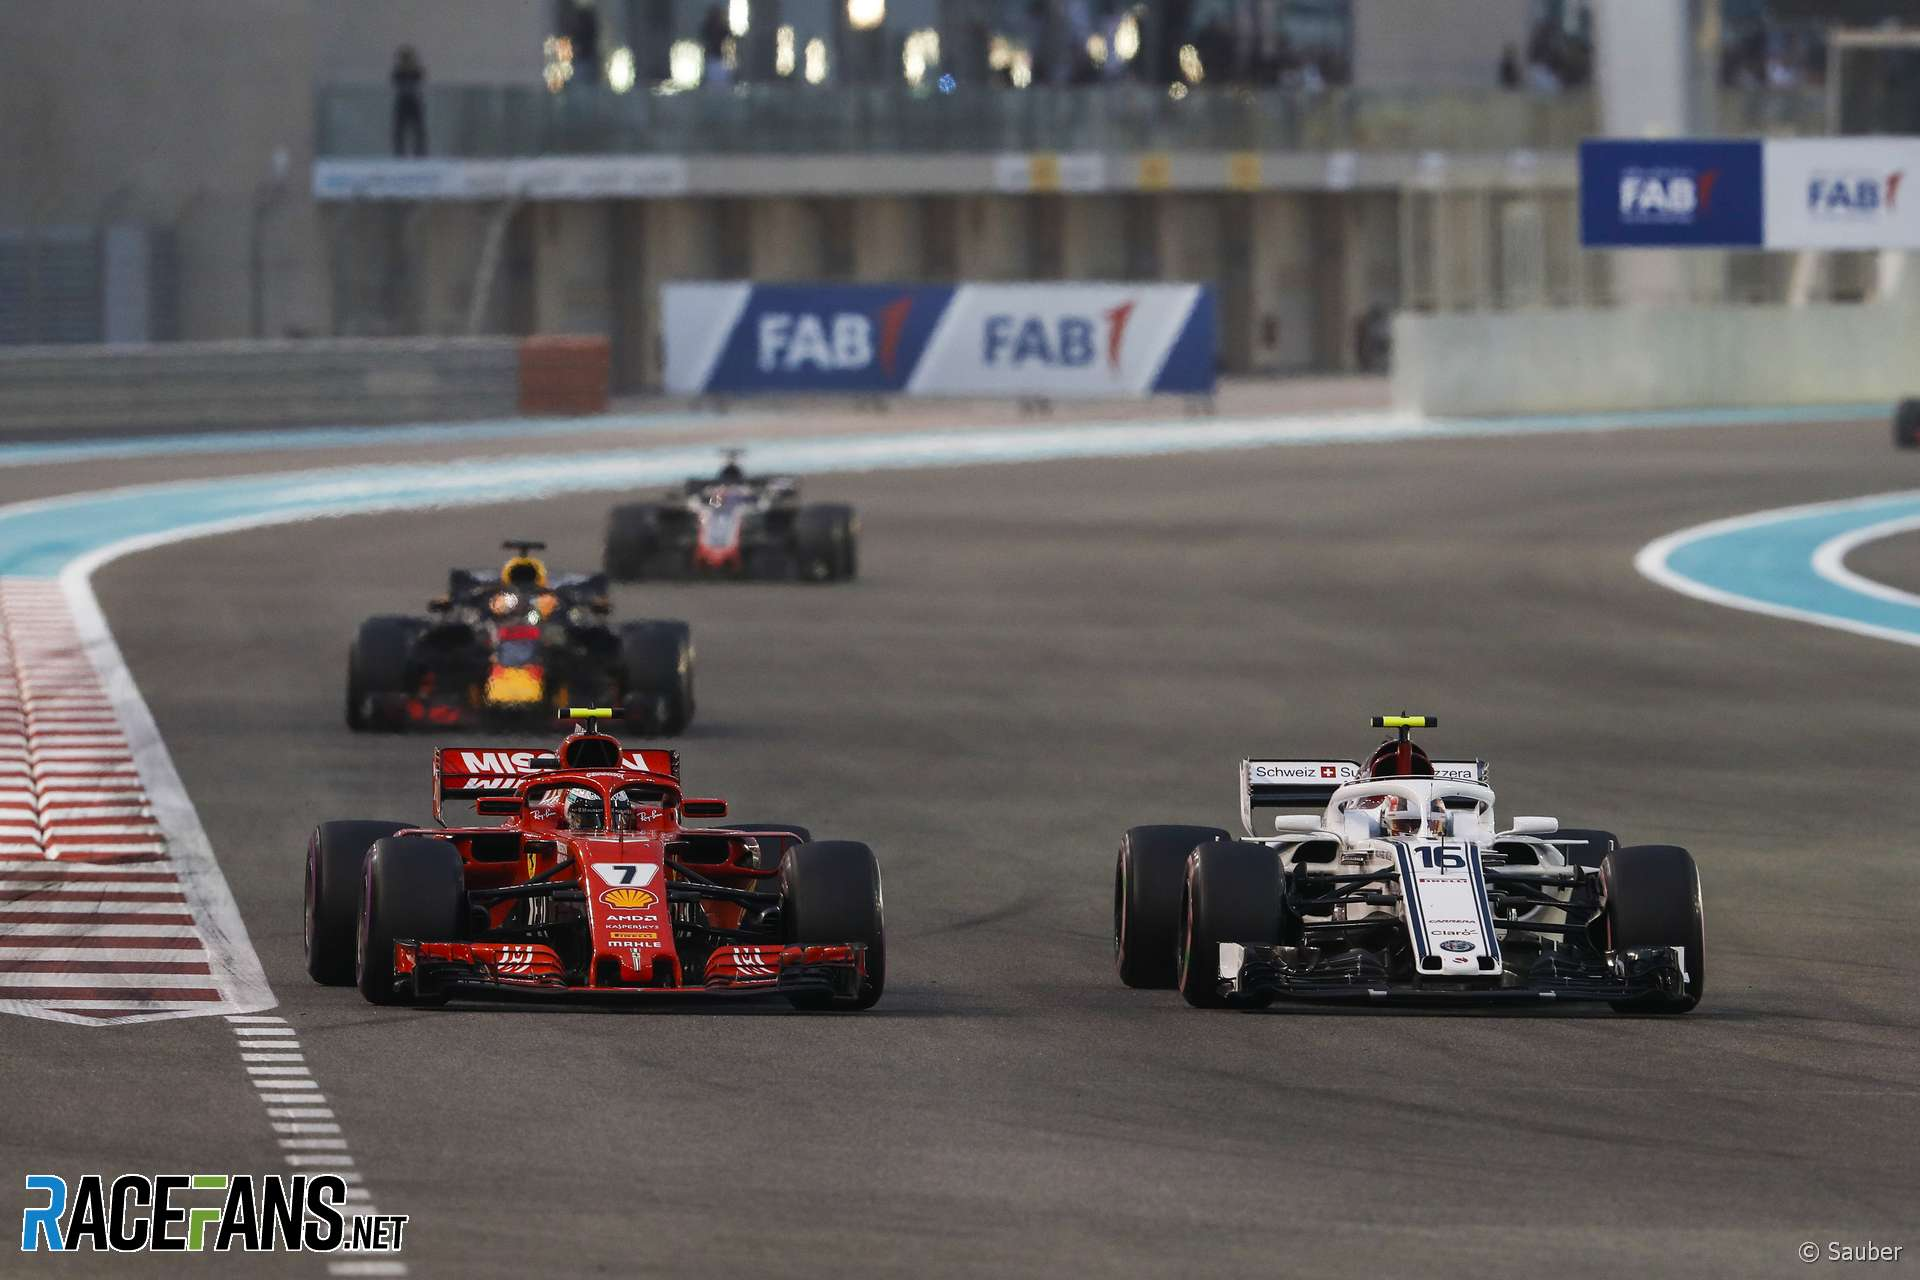 Kimi Raikkonen, Charles Leclerc, Yas Marina, 2018